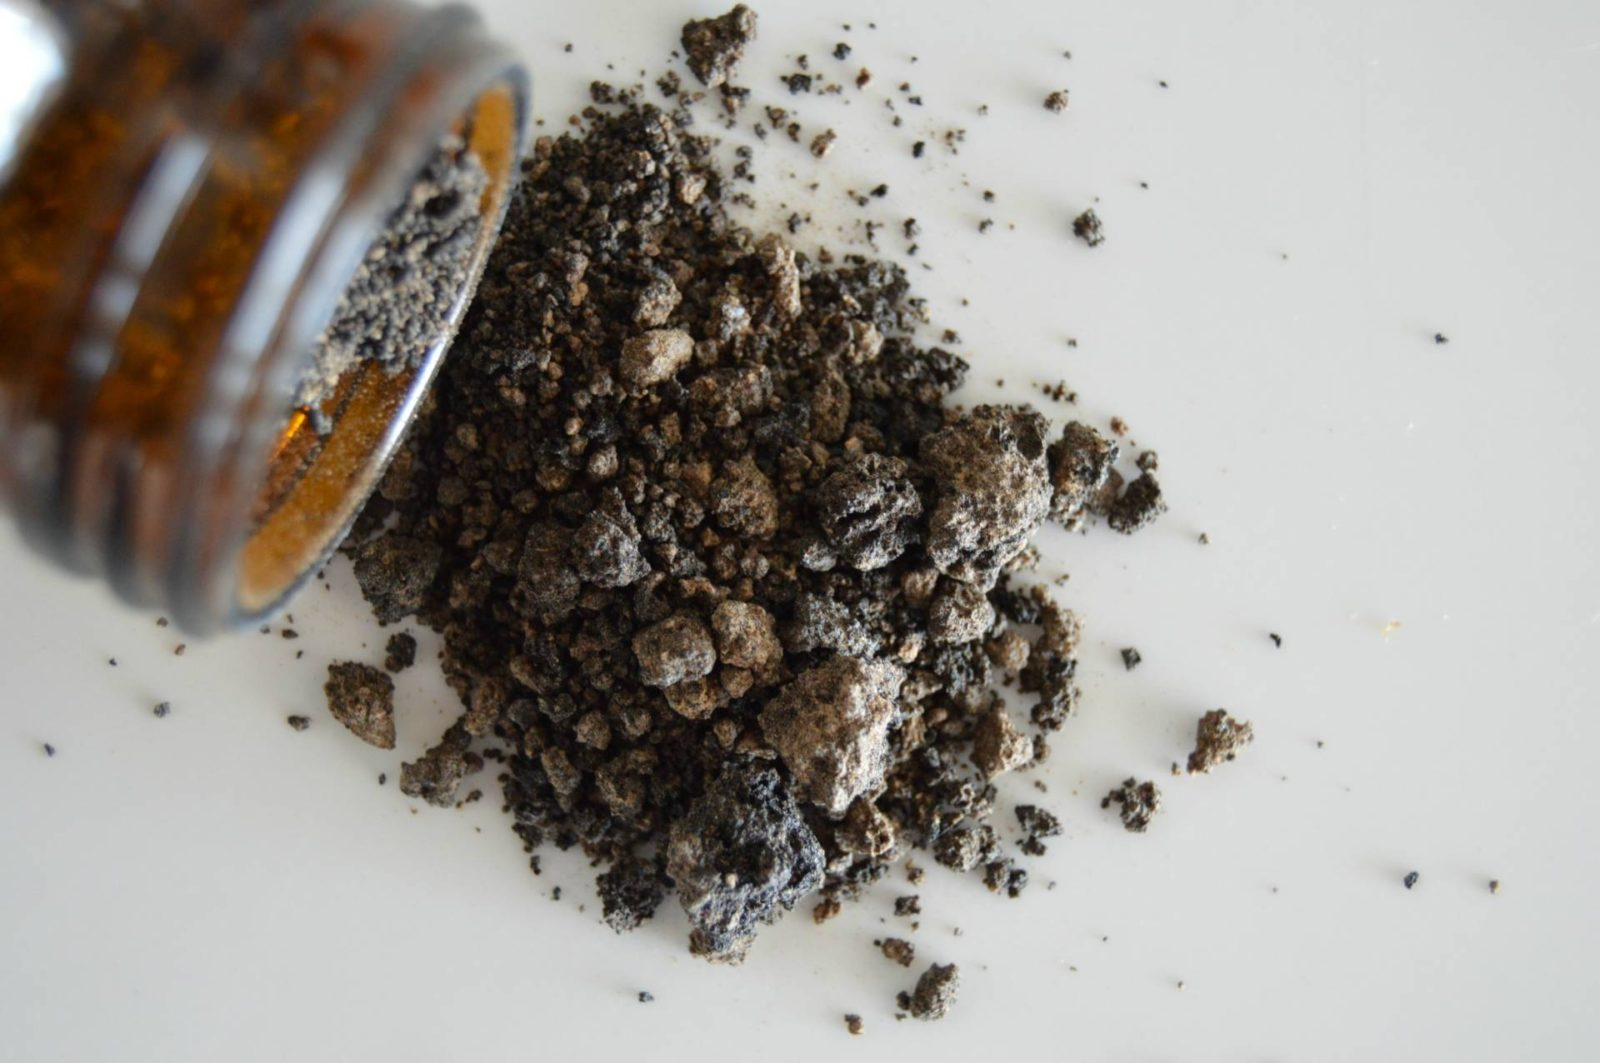 Shea Terra Organics – African Black Soap, Baobab & Coconut Water Face Masque